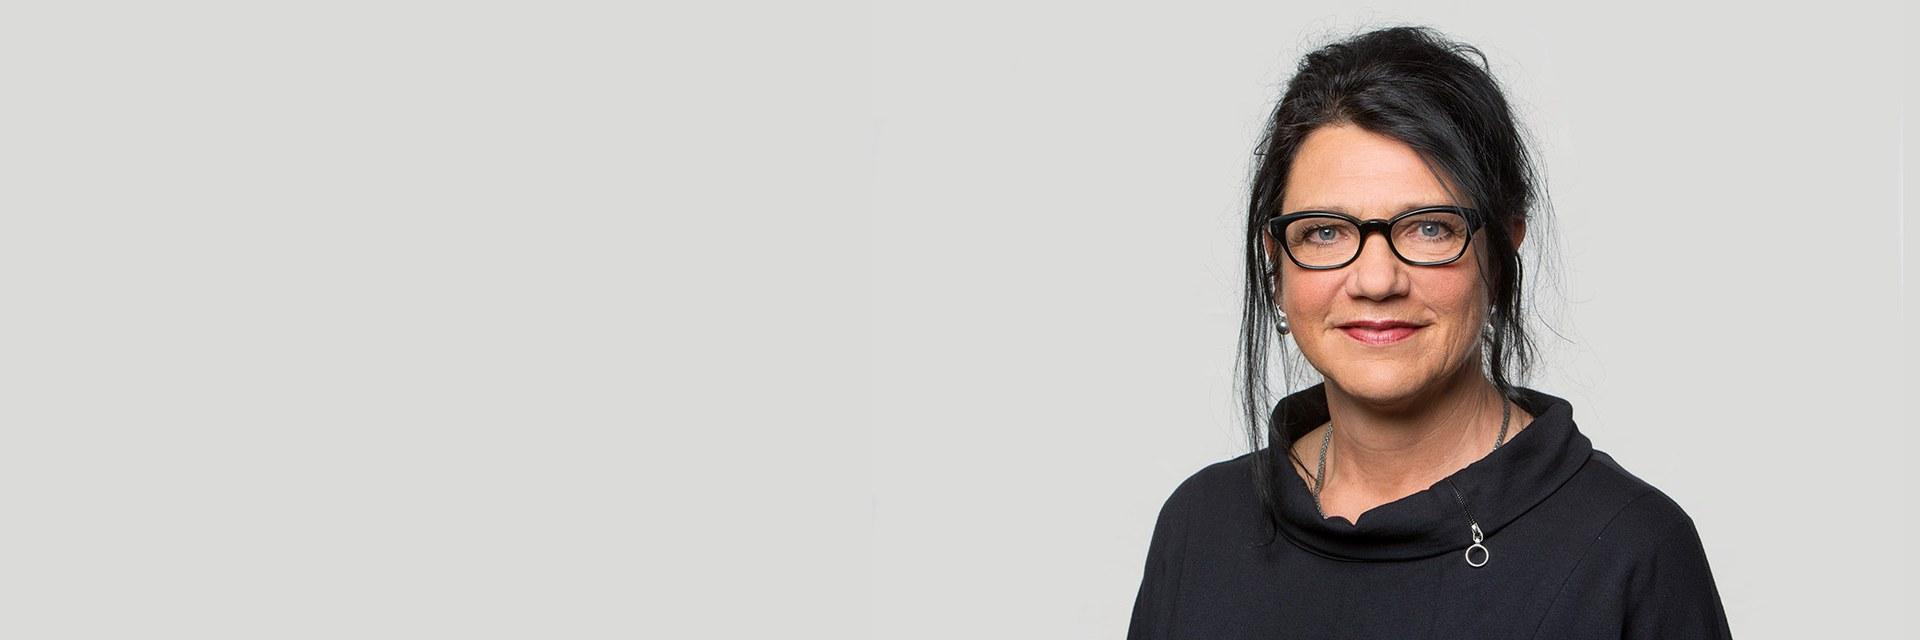 Prof. Dr. Dorothea Lage